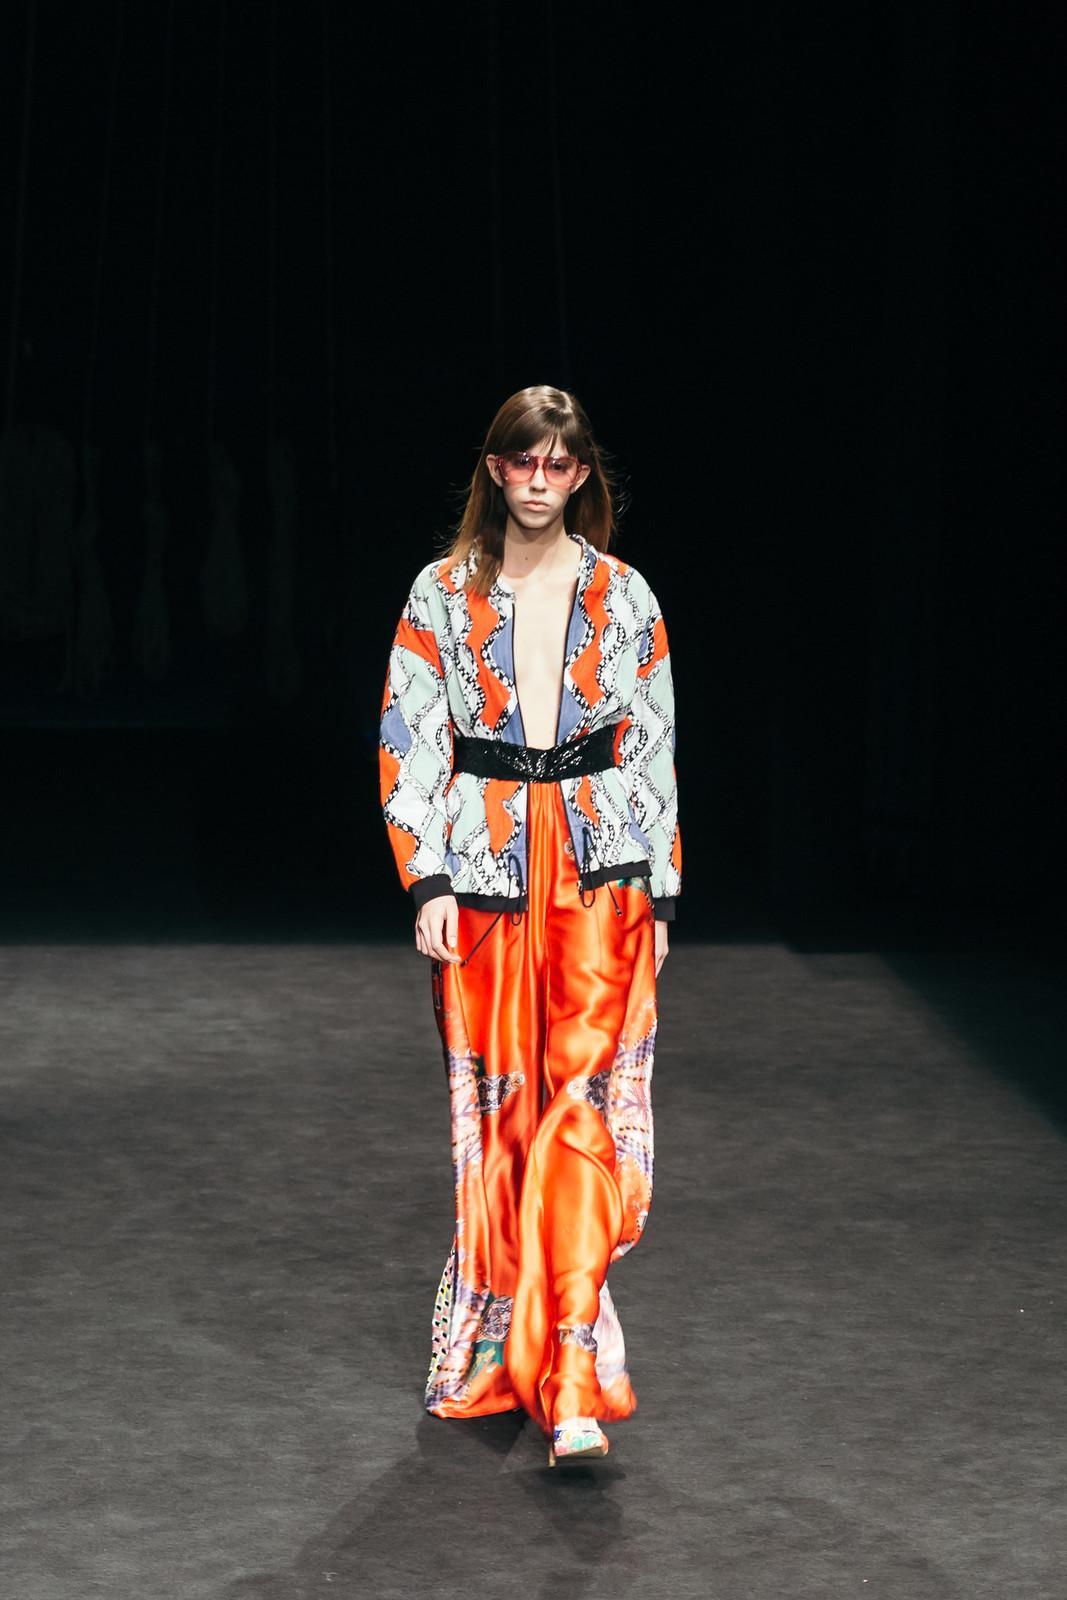 Jessie Chanes - Seams for a desire - 080 Bacelona Fashion #080bcnfasion -1